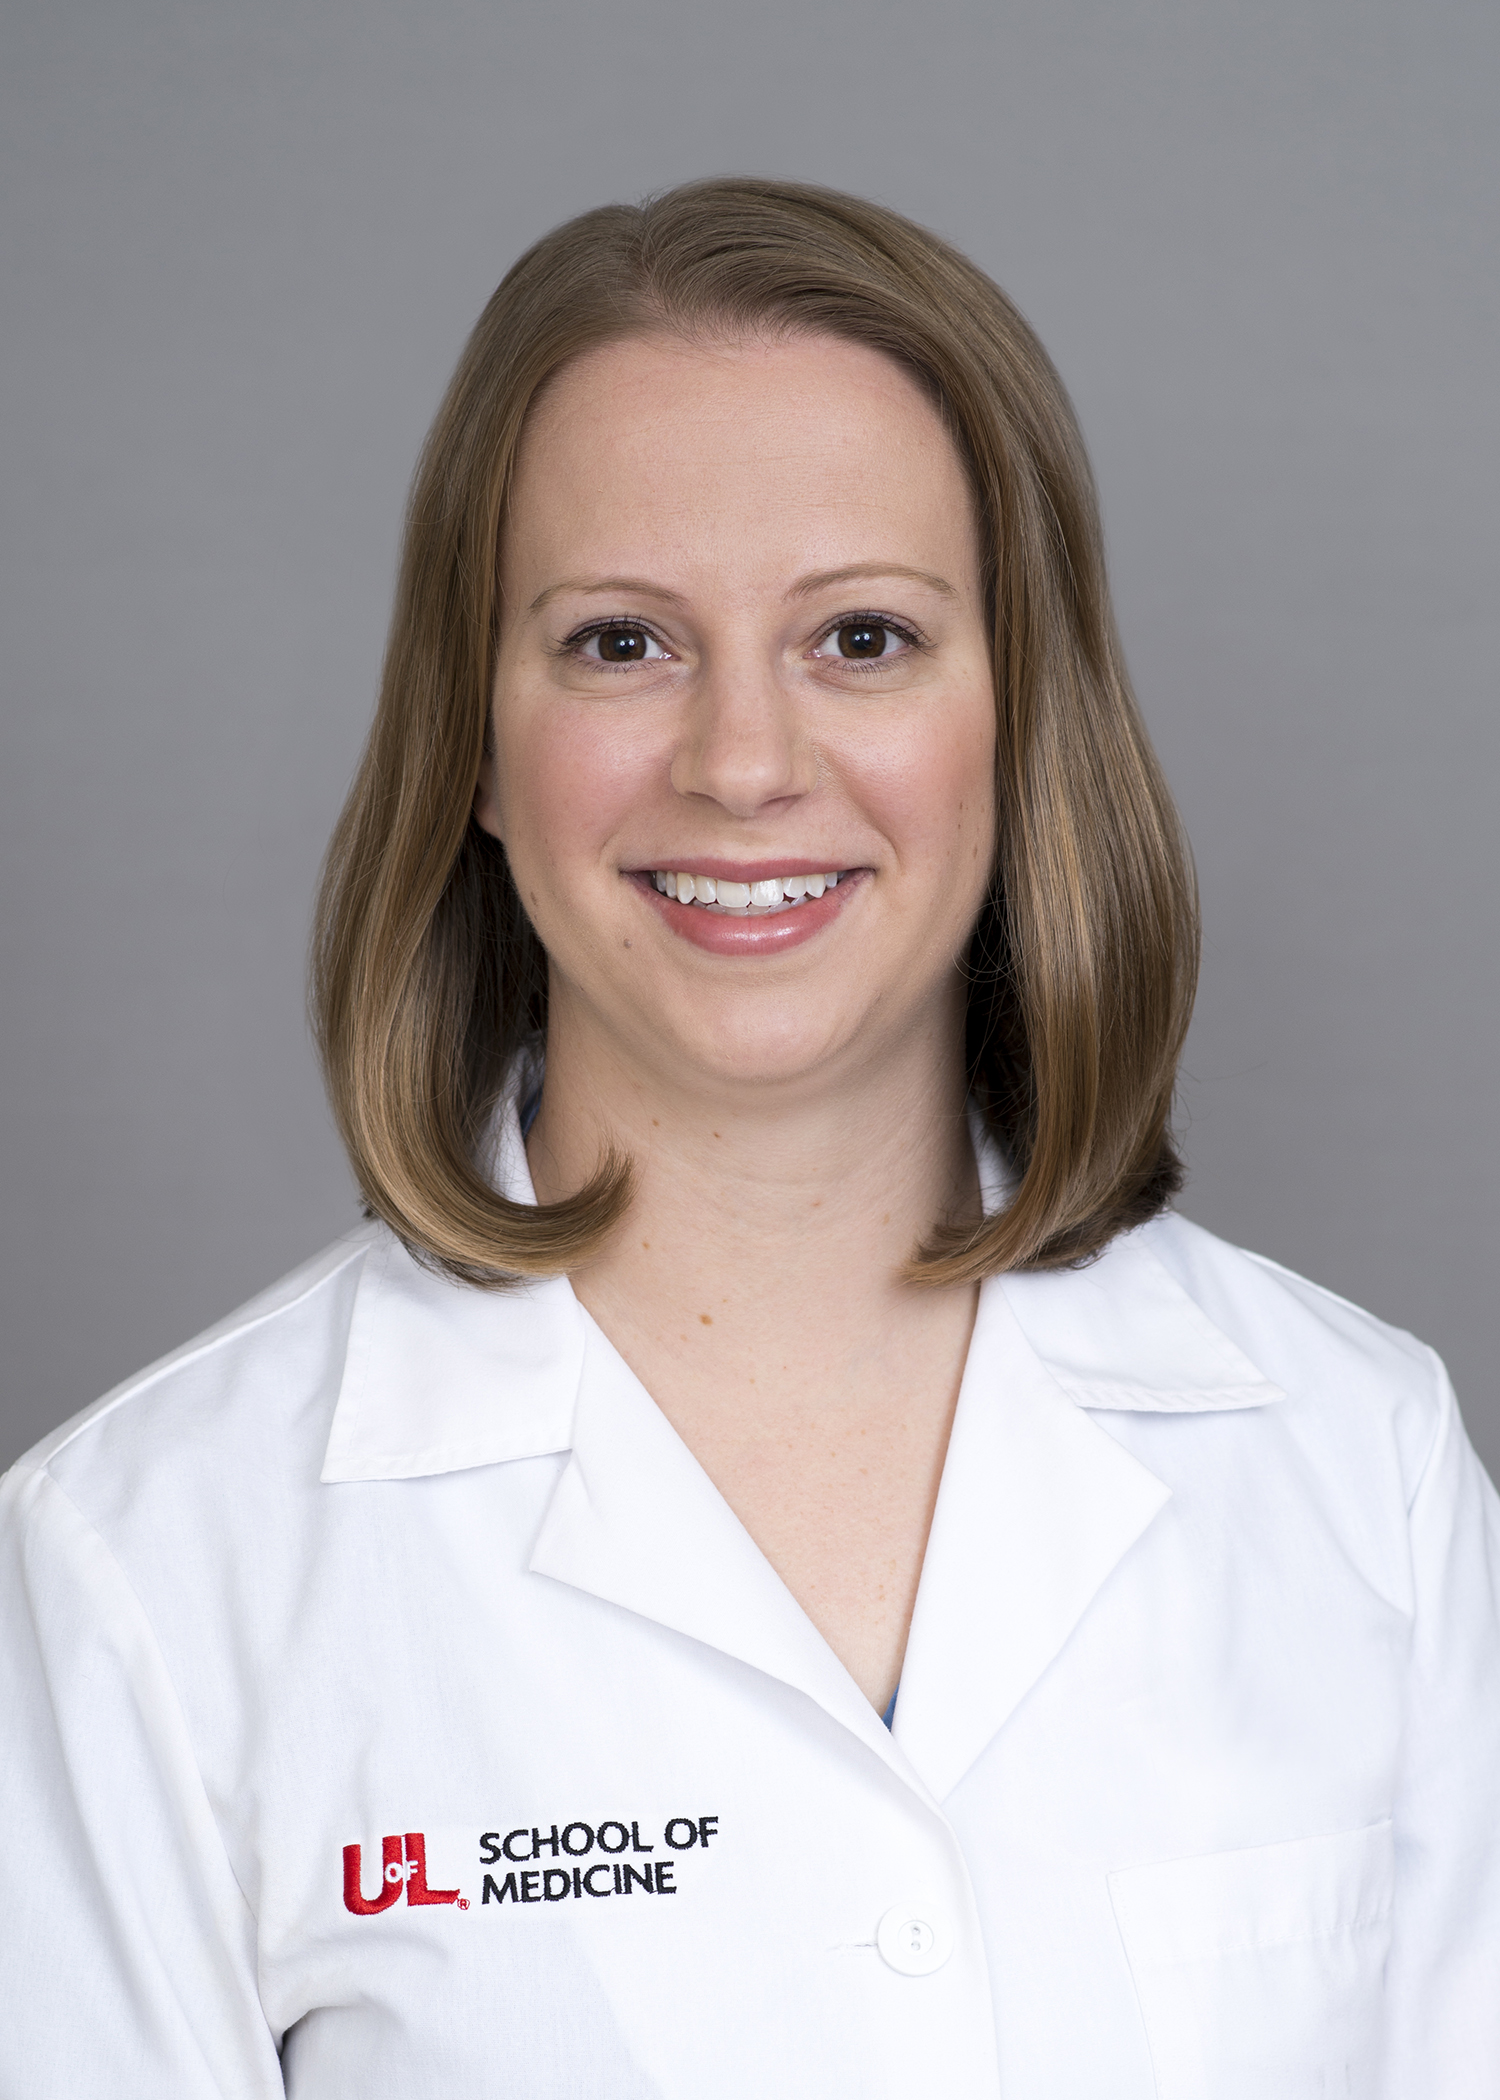 Meredith Tatarzycki